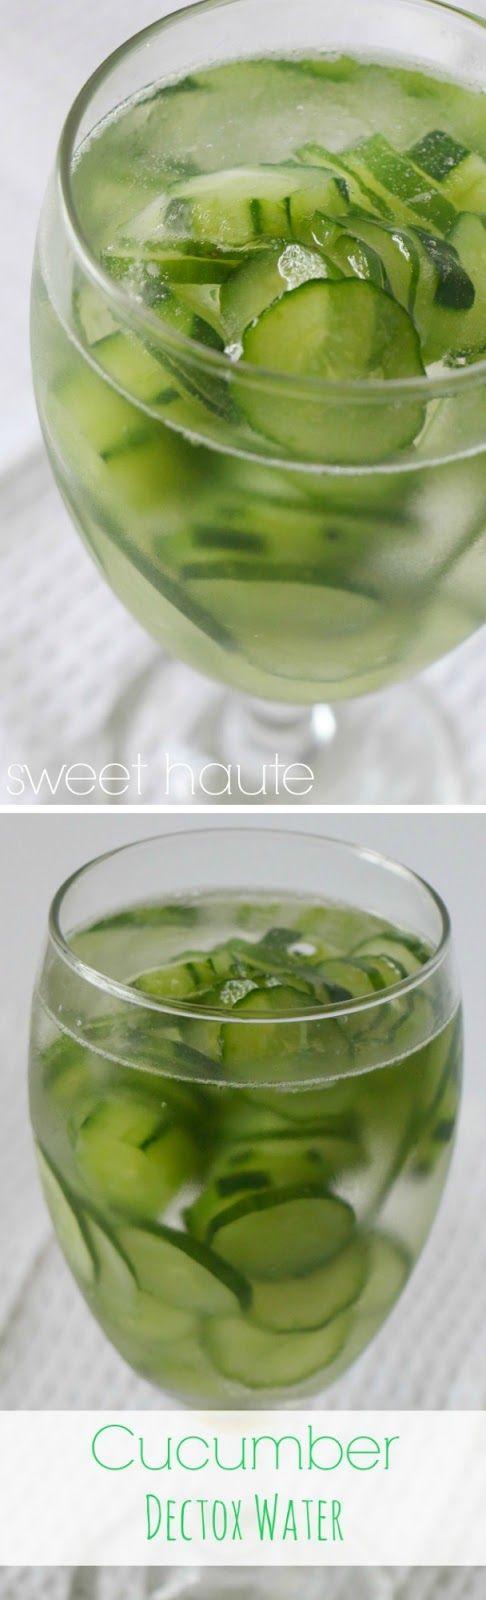 Cucumber Detox Water + Essential Oil Lime- SWEET HAUTE antioxidants, natural weight management benefits